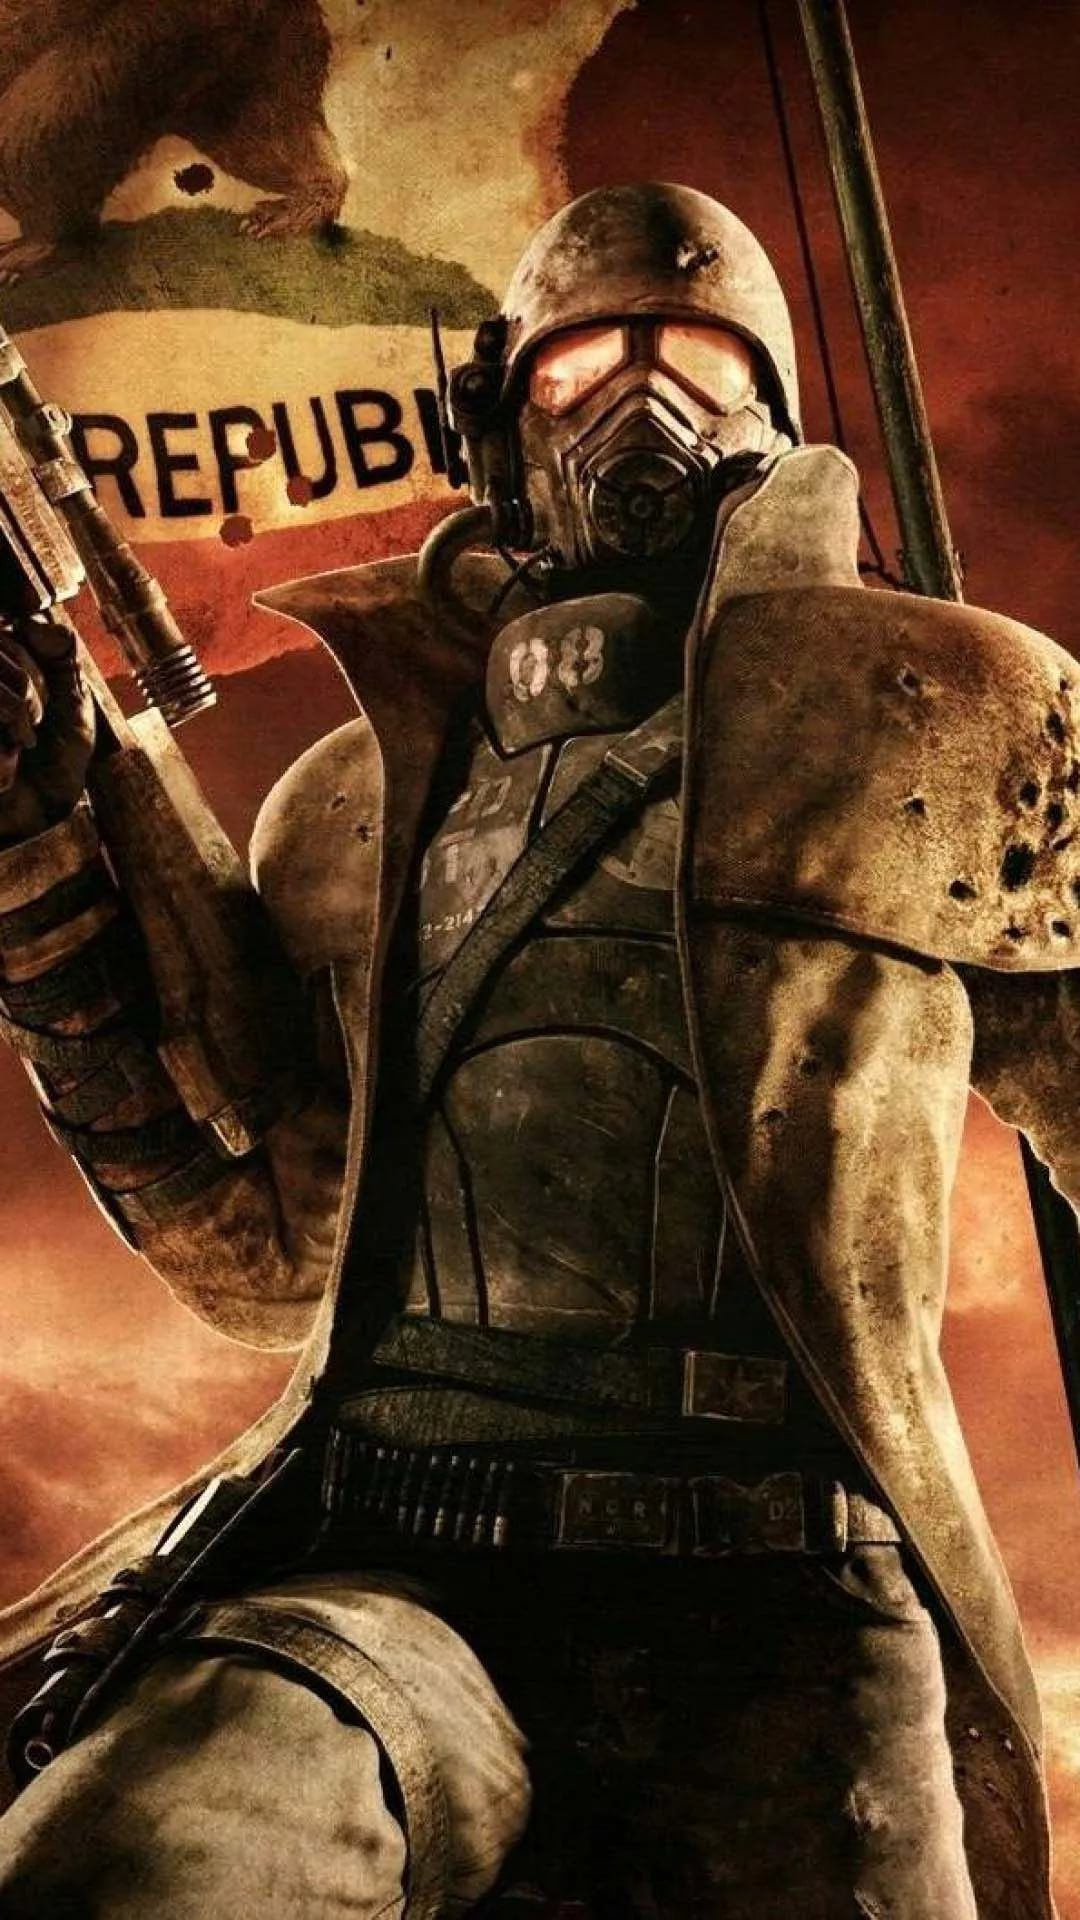 Fallout New Vegas hd wallpaper